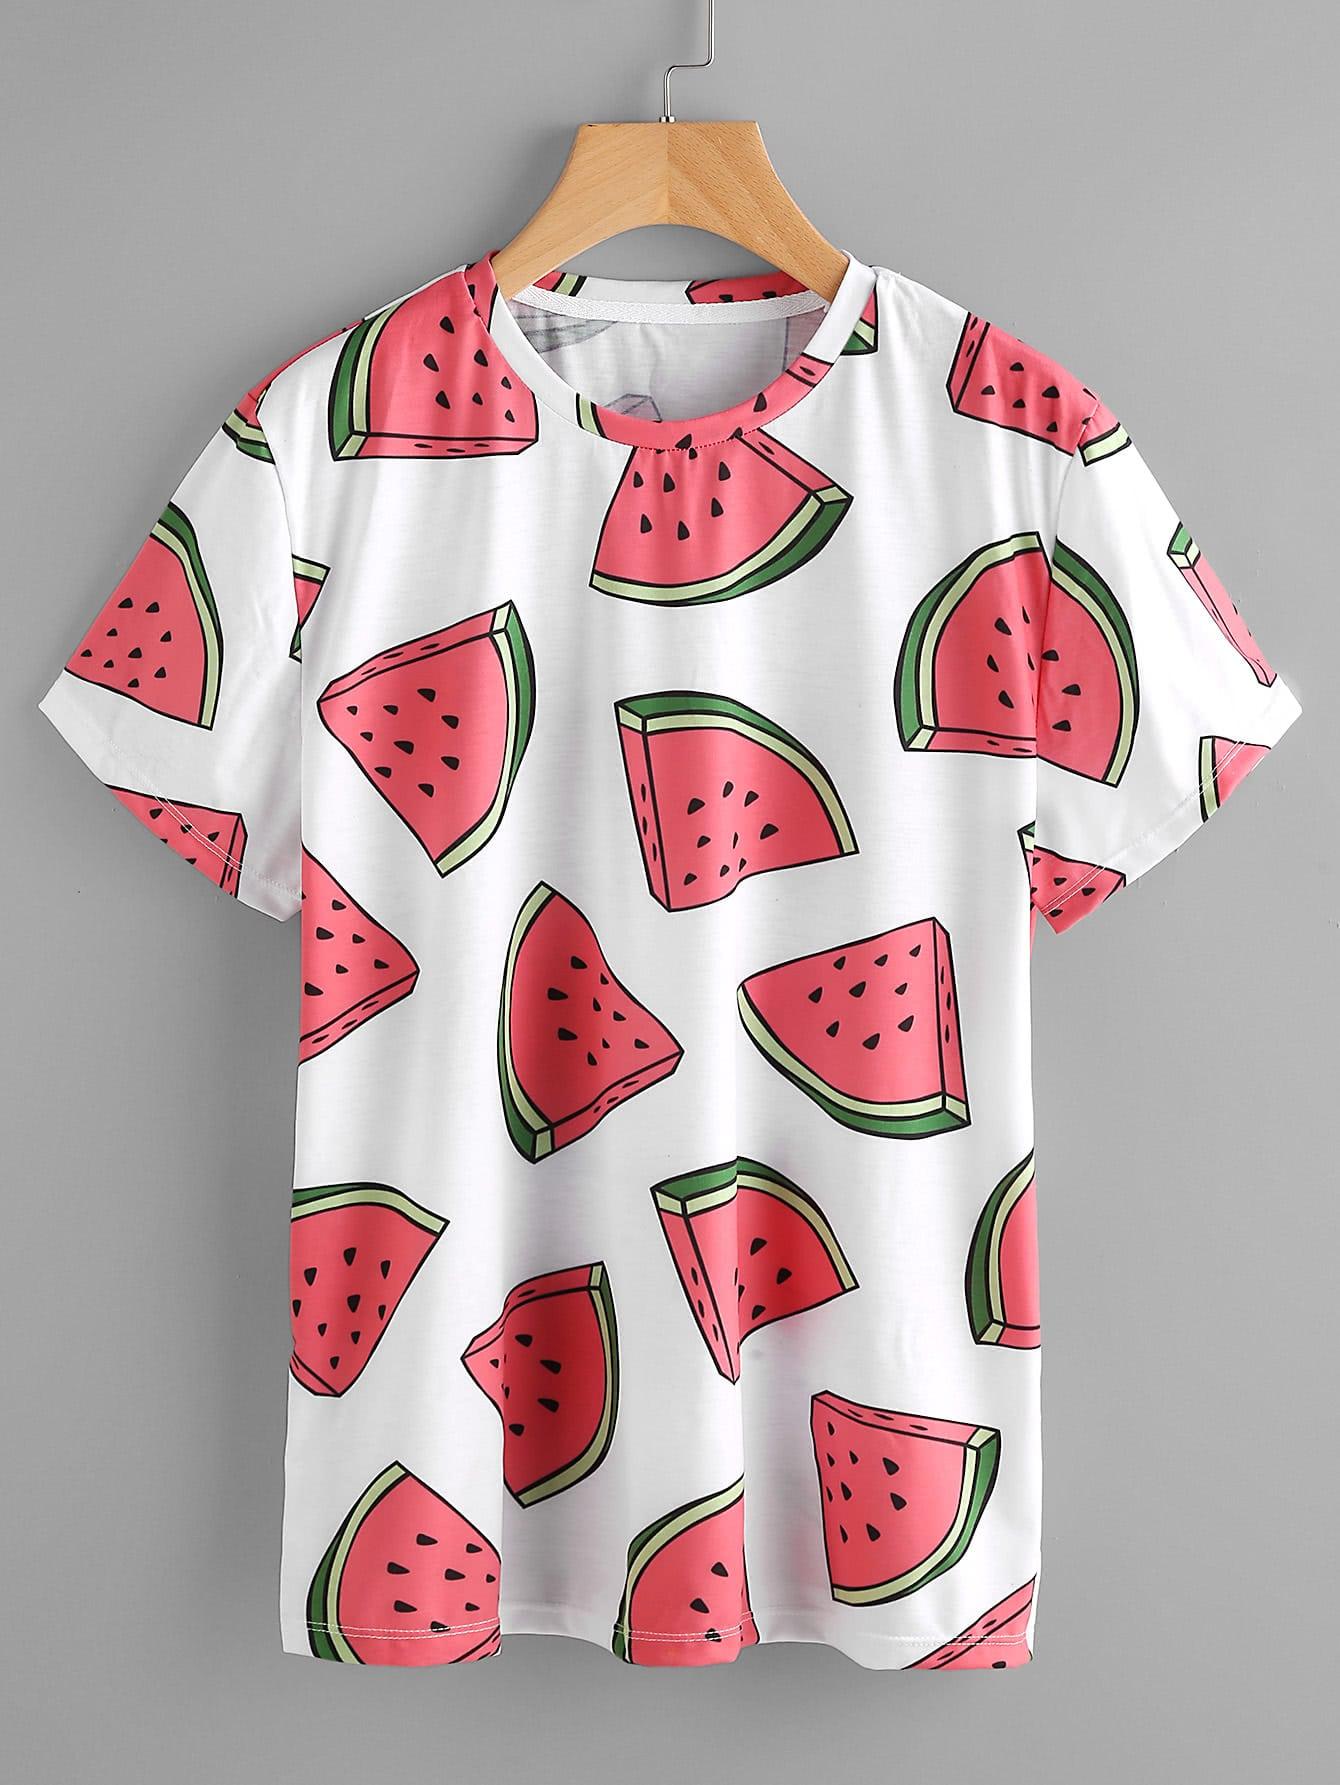 Camiseta Estampa de Melancia